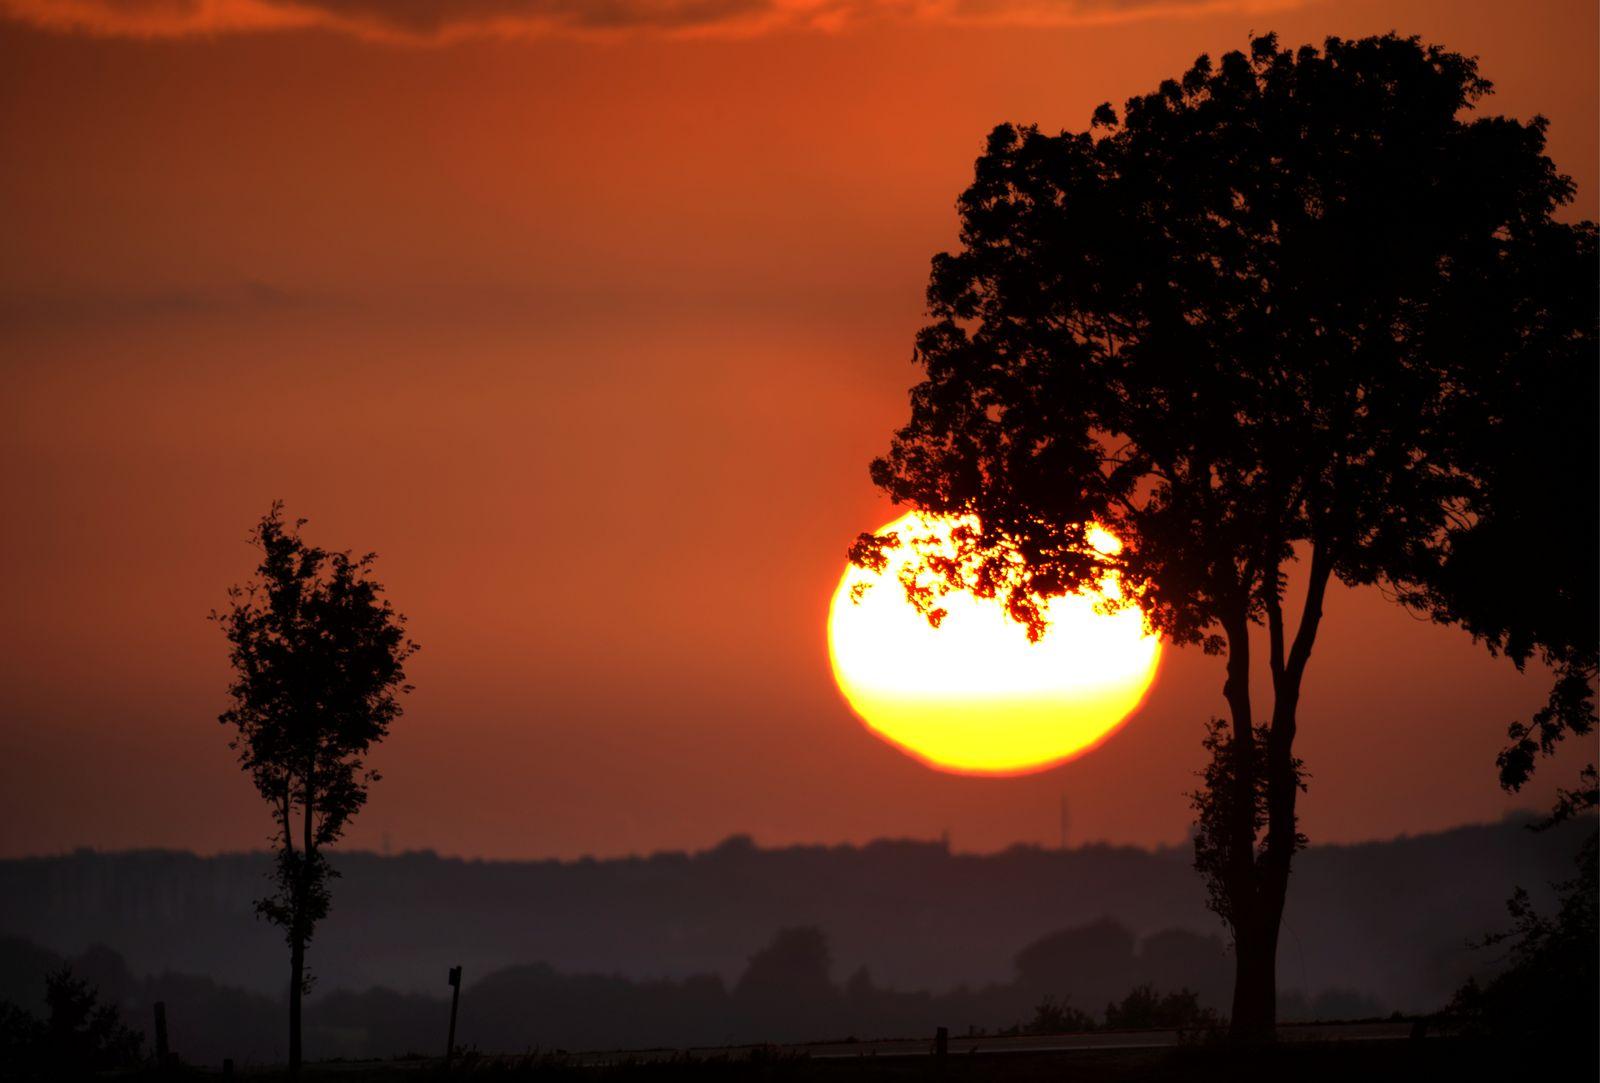 Längste Videos nach Tag: natur euter